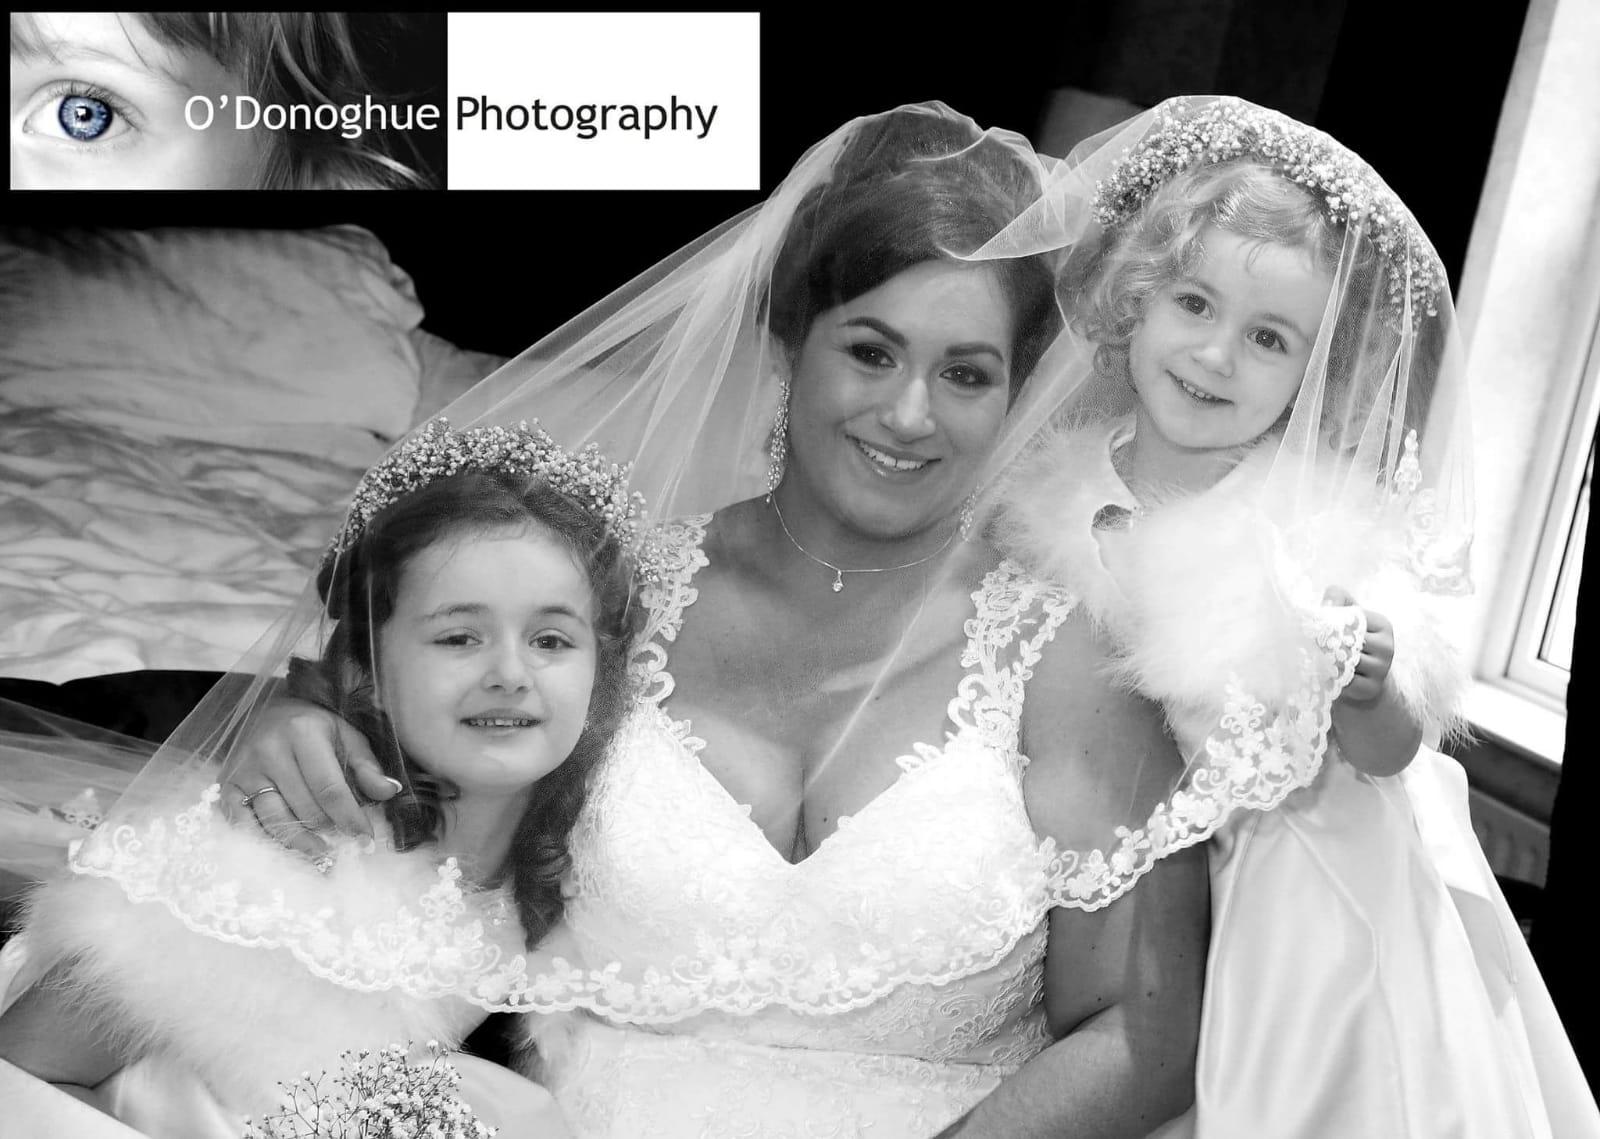 Finbarr O'Donoghue Photography